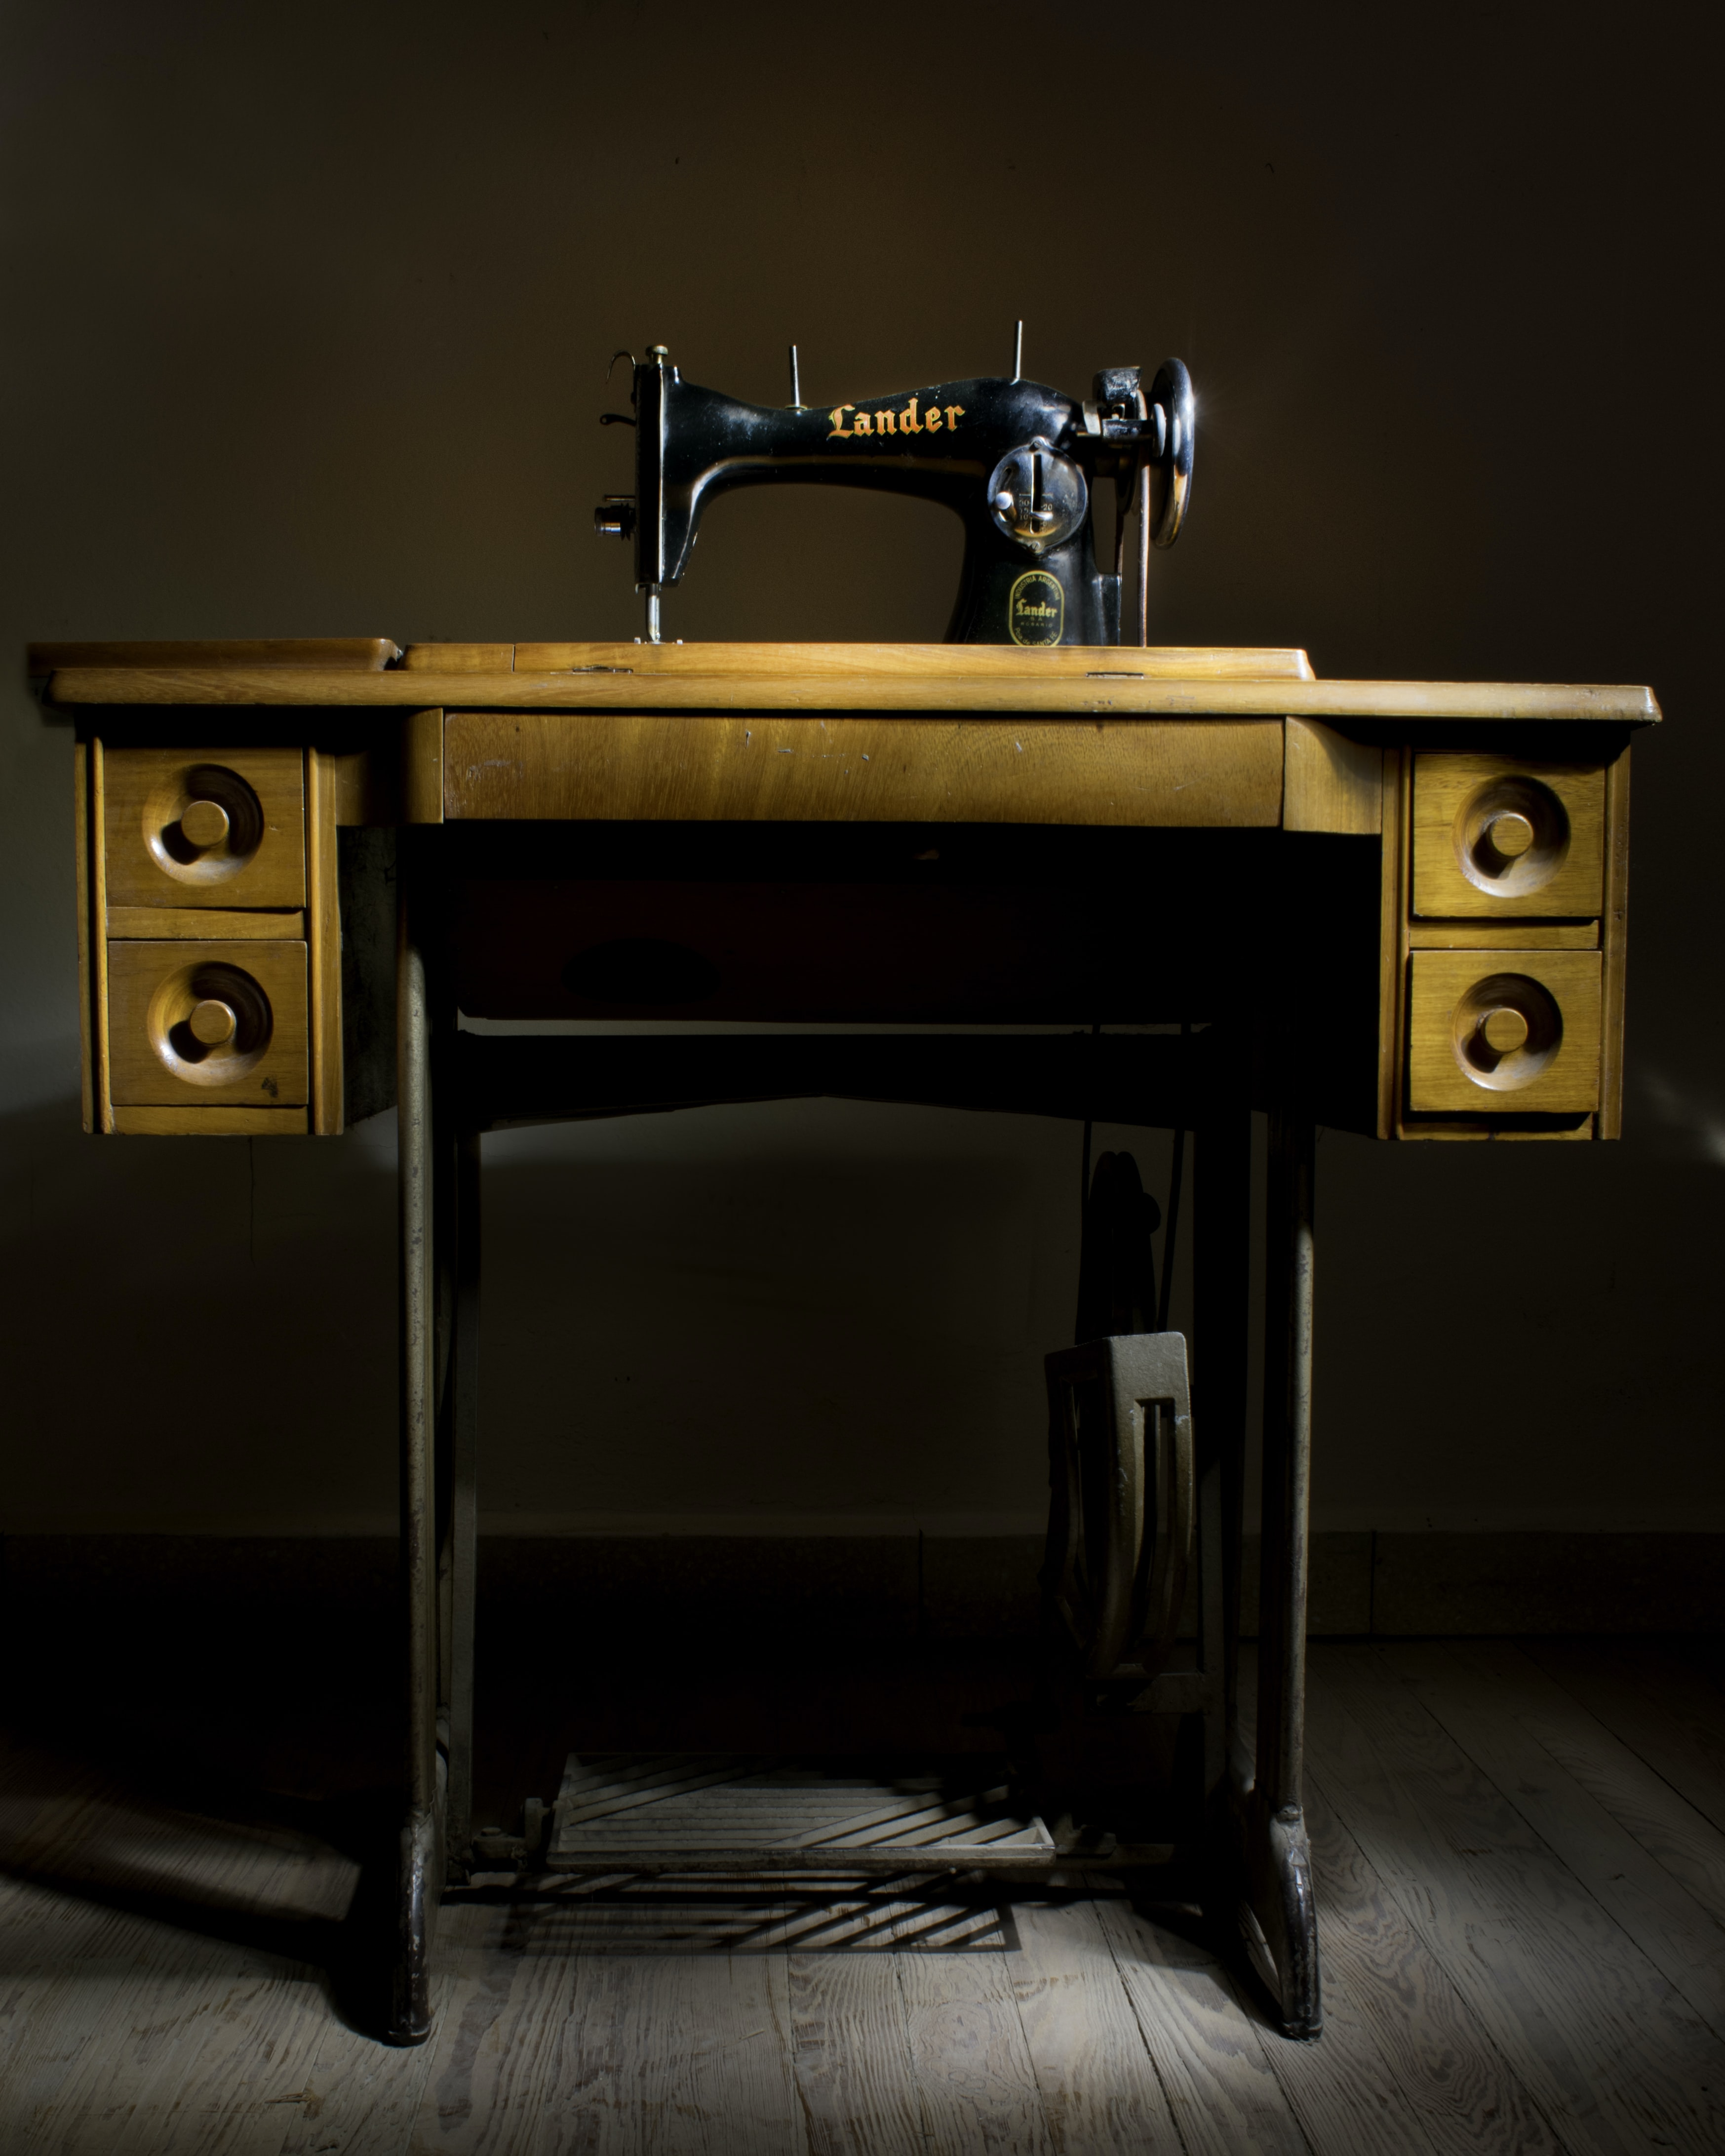 black Lander sewing machine